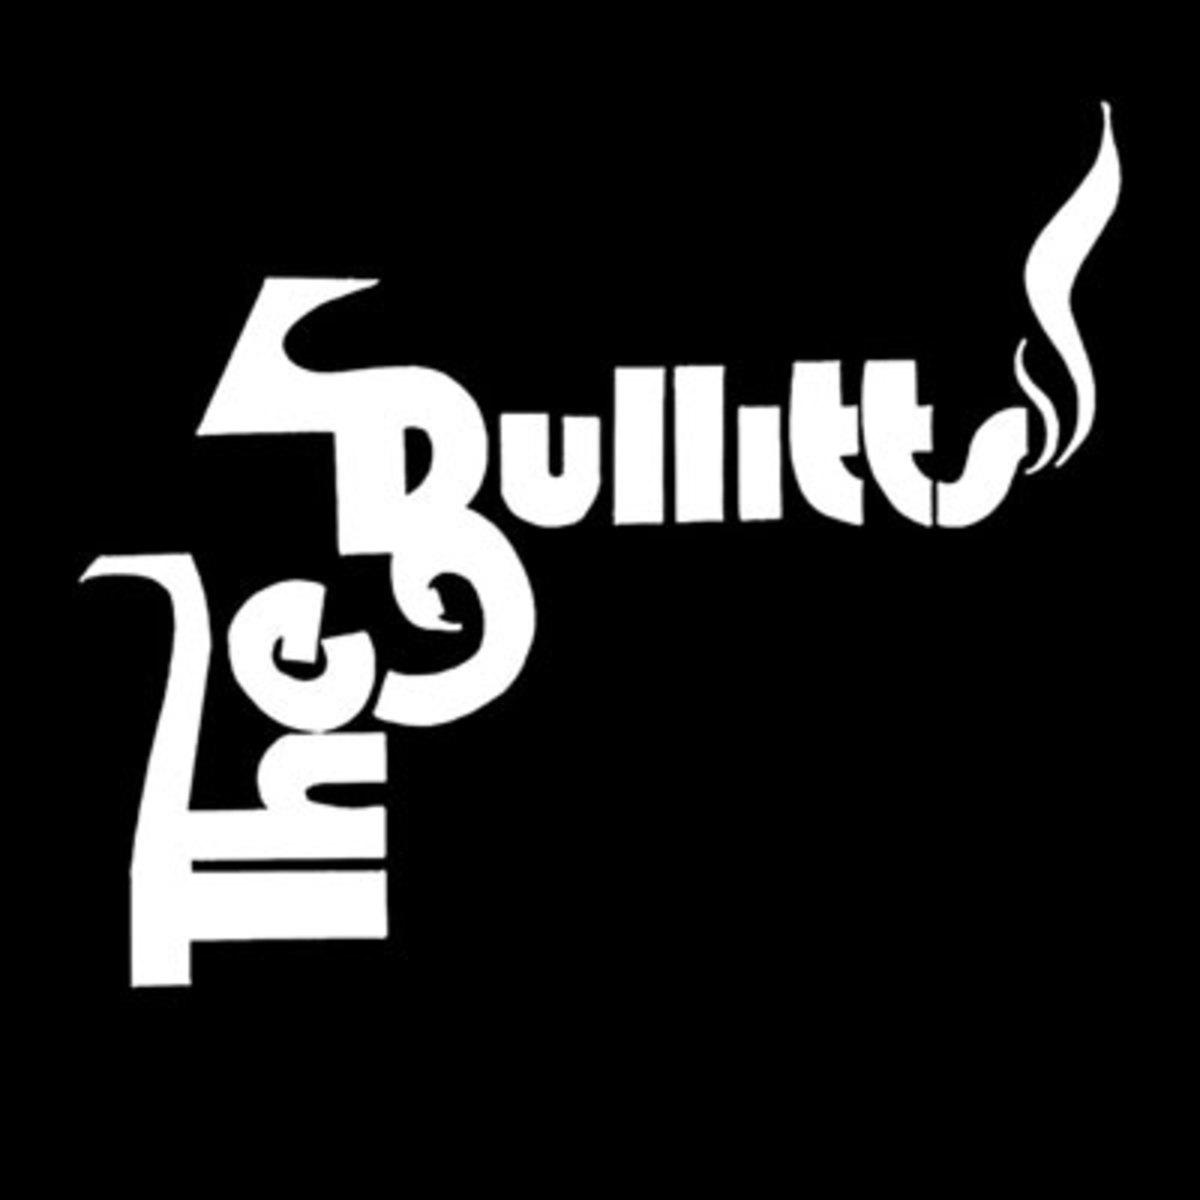 thebullits.jpg